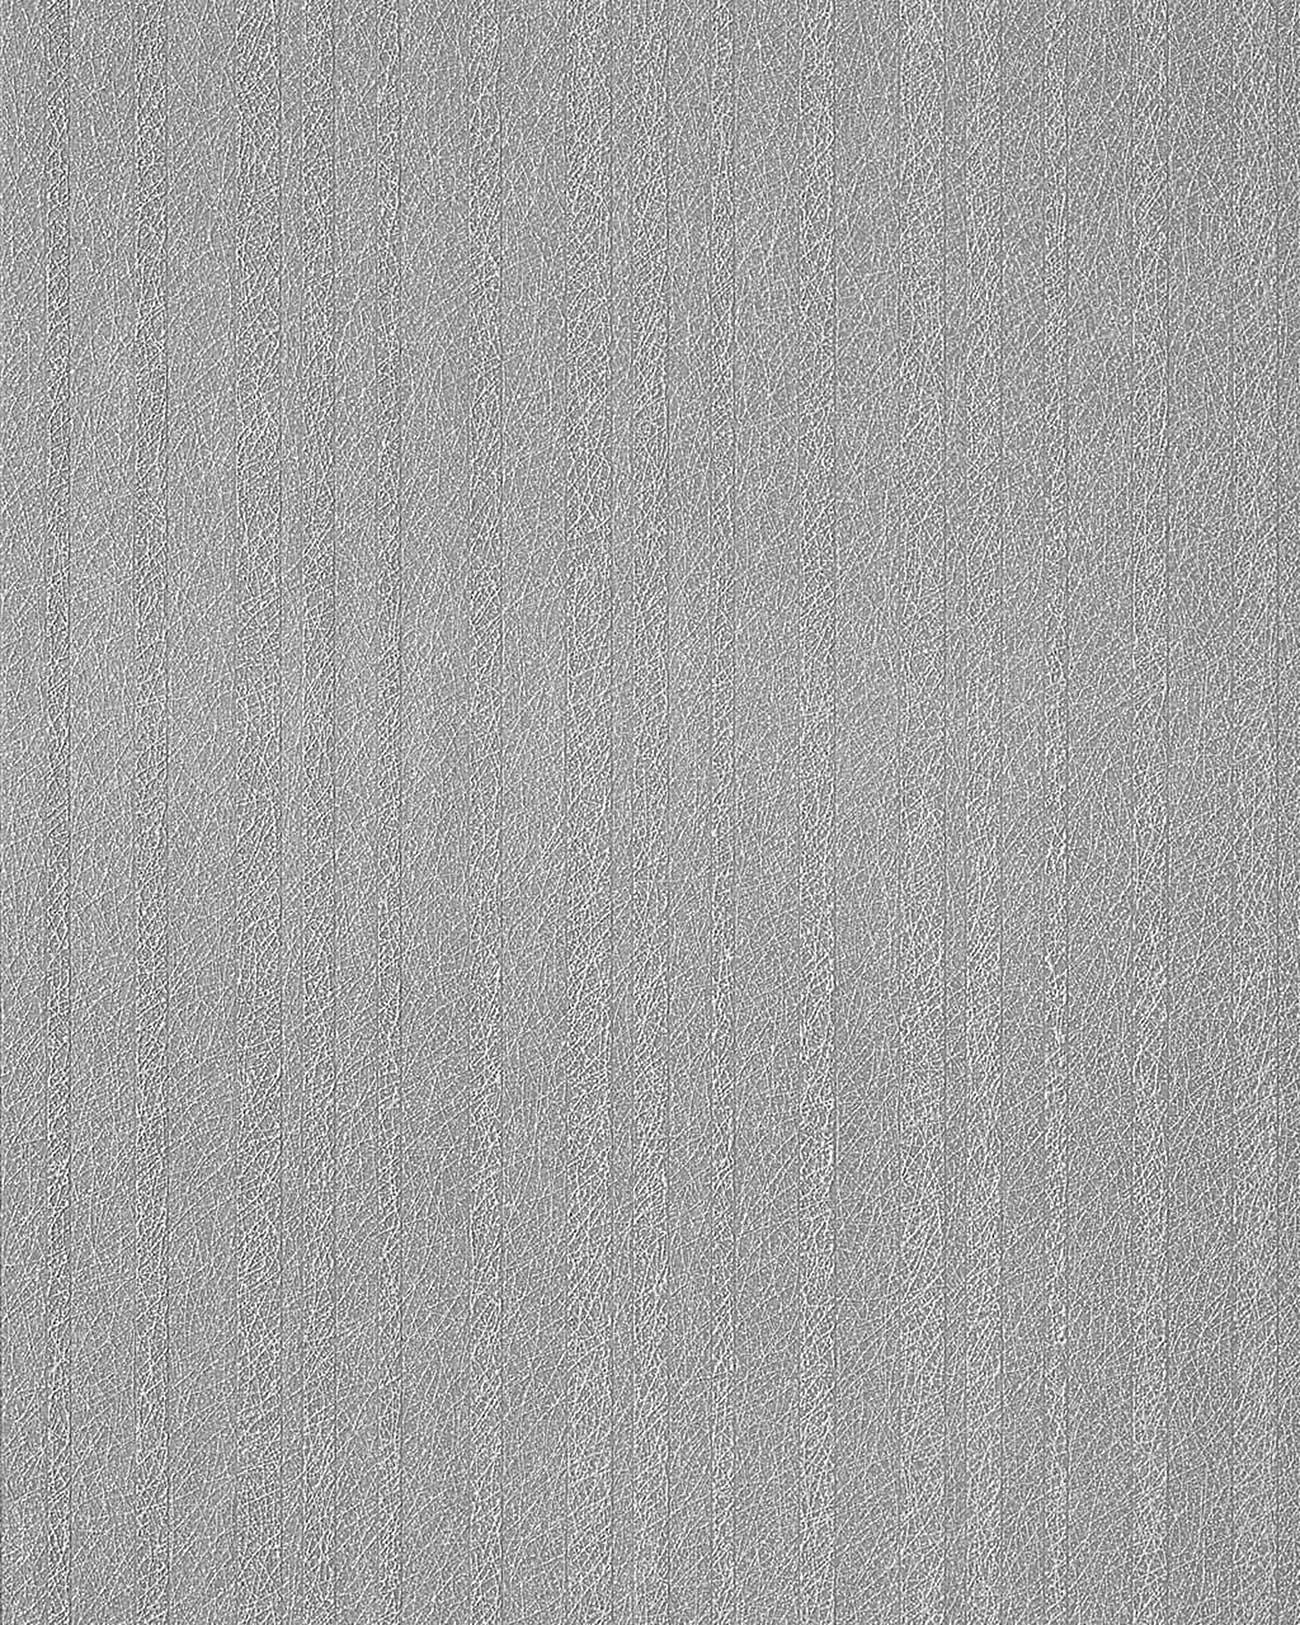 Edem 1015 16 fashion design plain wallpaper textured for Gray textured wallpaper